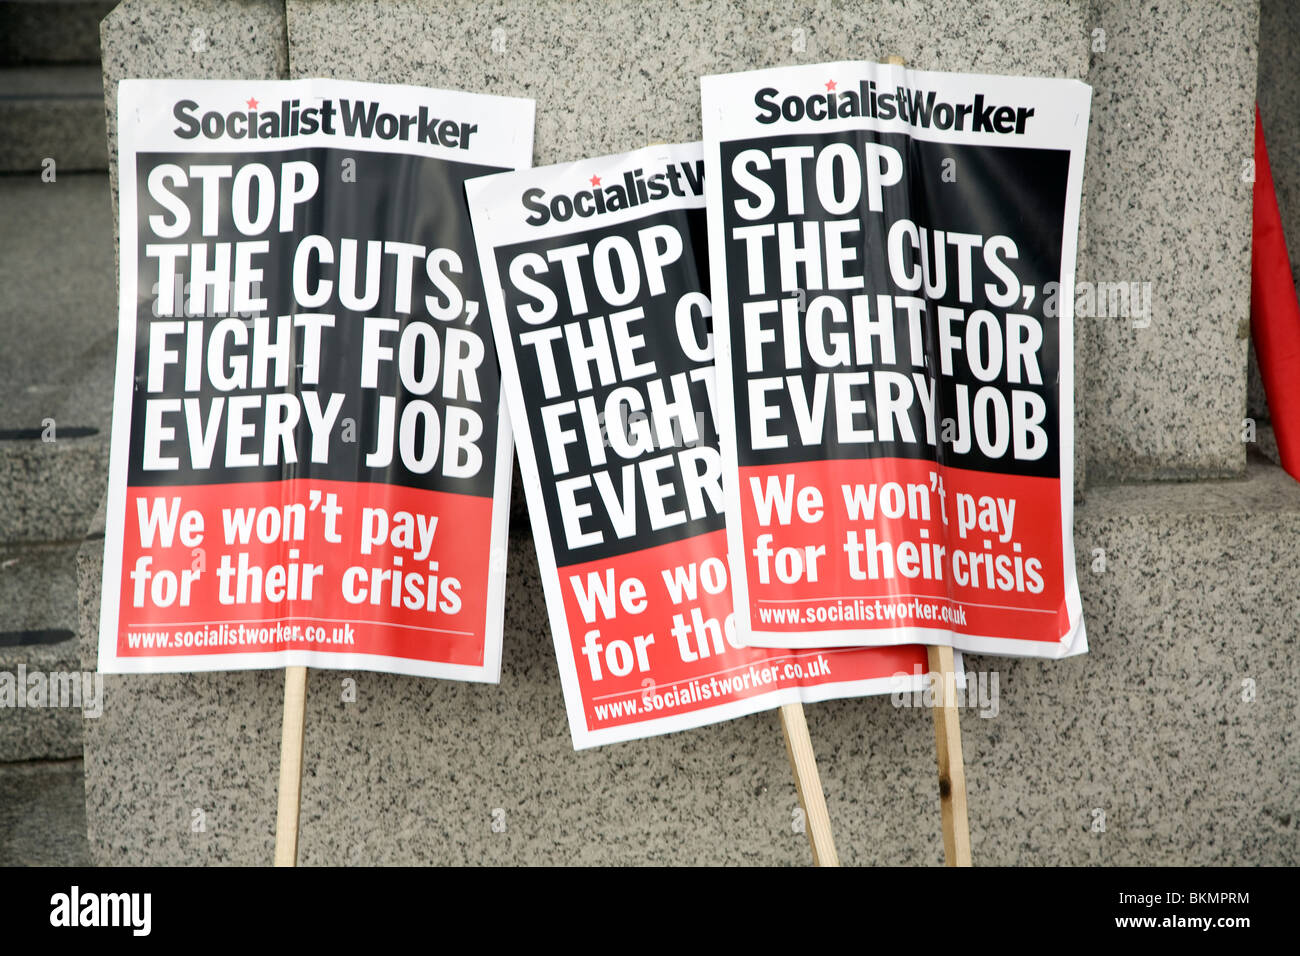 Mai und Kundgebung am Trafalgar Square, 1. Mai 2010 Socialist Worker party Banner Stockbild